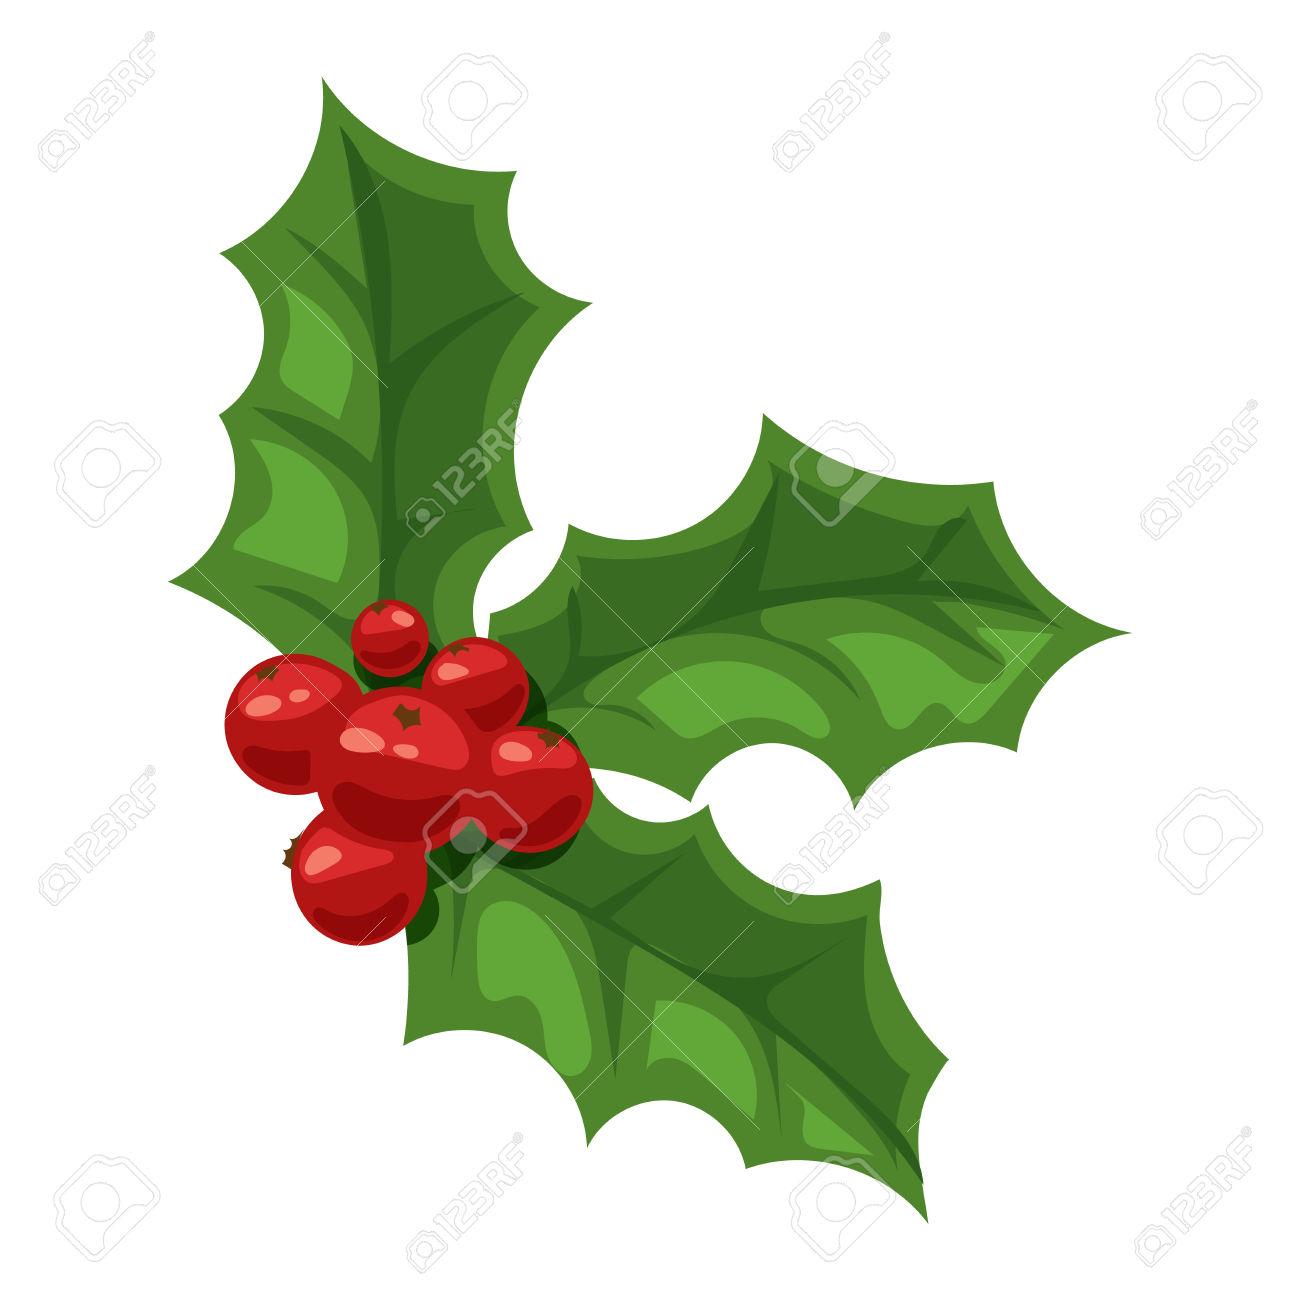 European Christmas Berry Holly Ilex Aquifolium Leaves And Fruit.